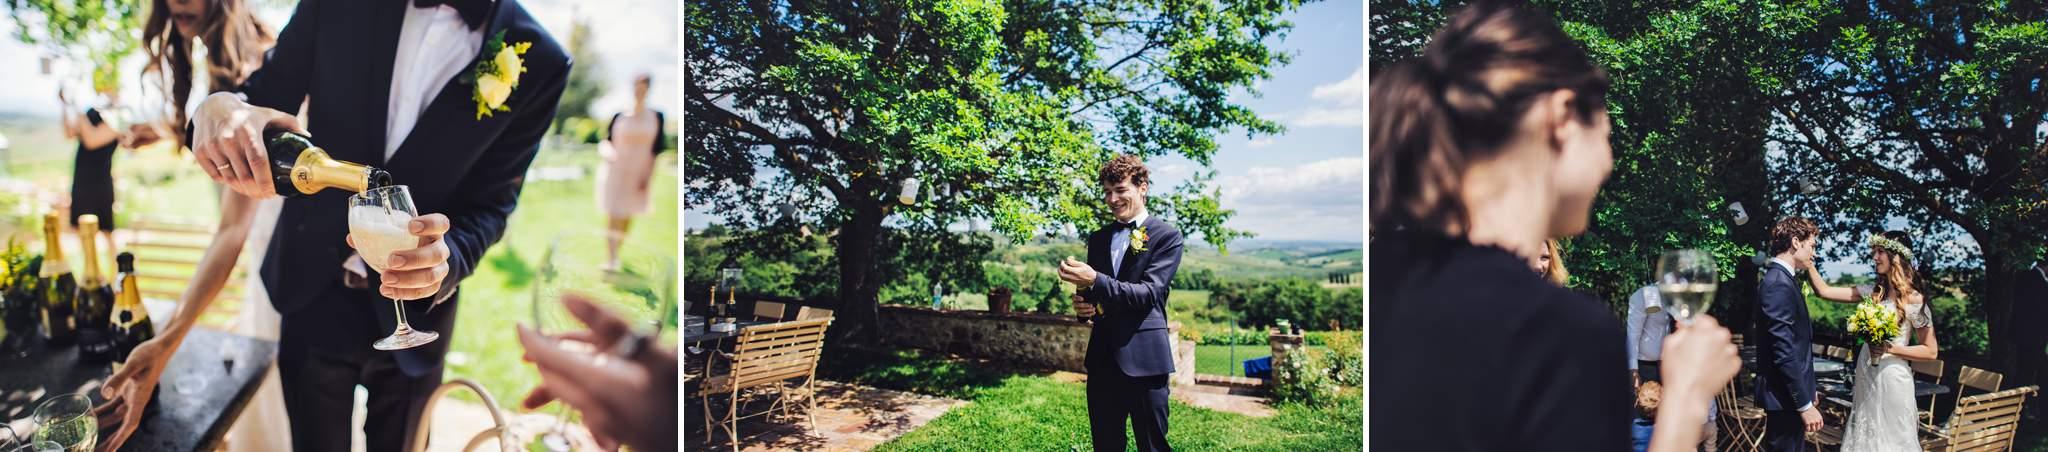 22wedding-photographer-tuscany-siena